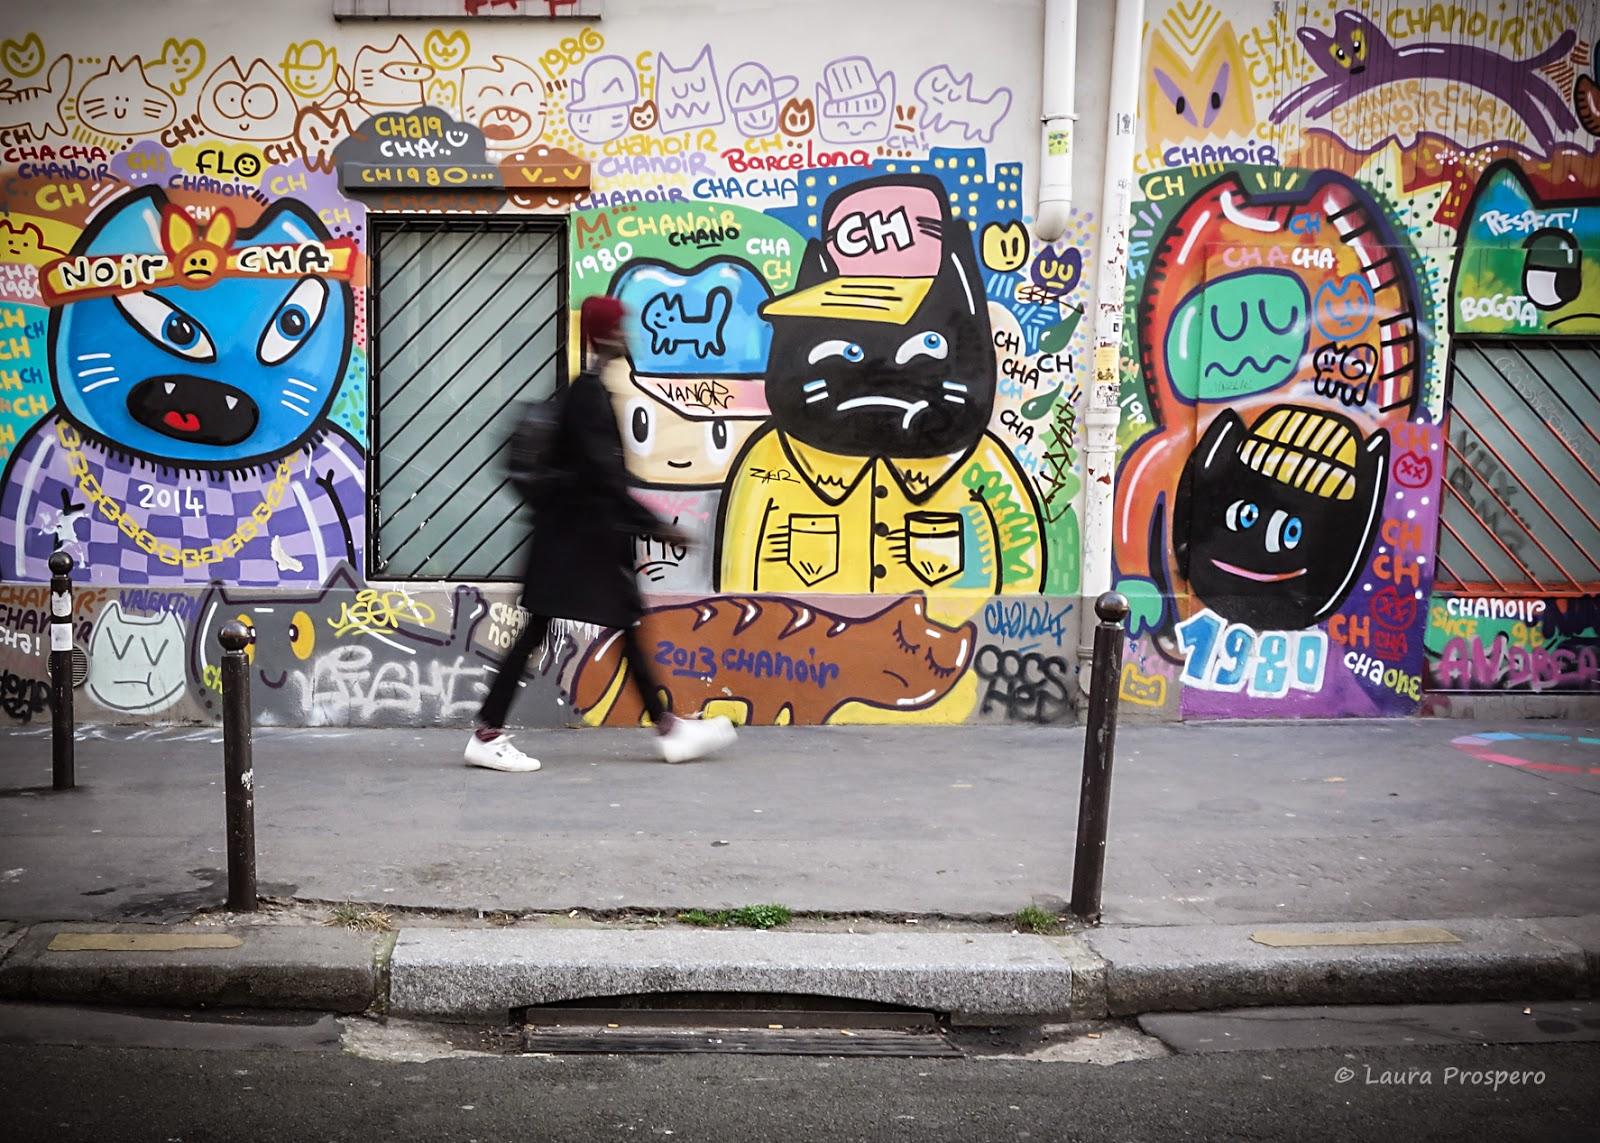 street art 10eme Paris - chatnoir